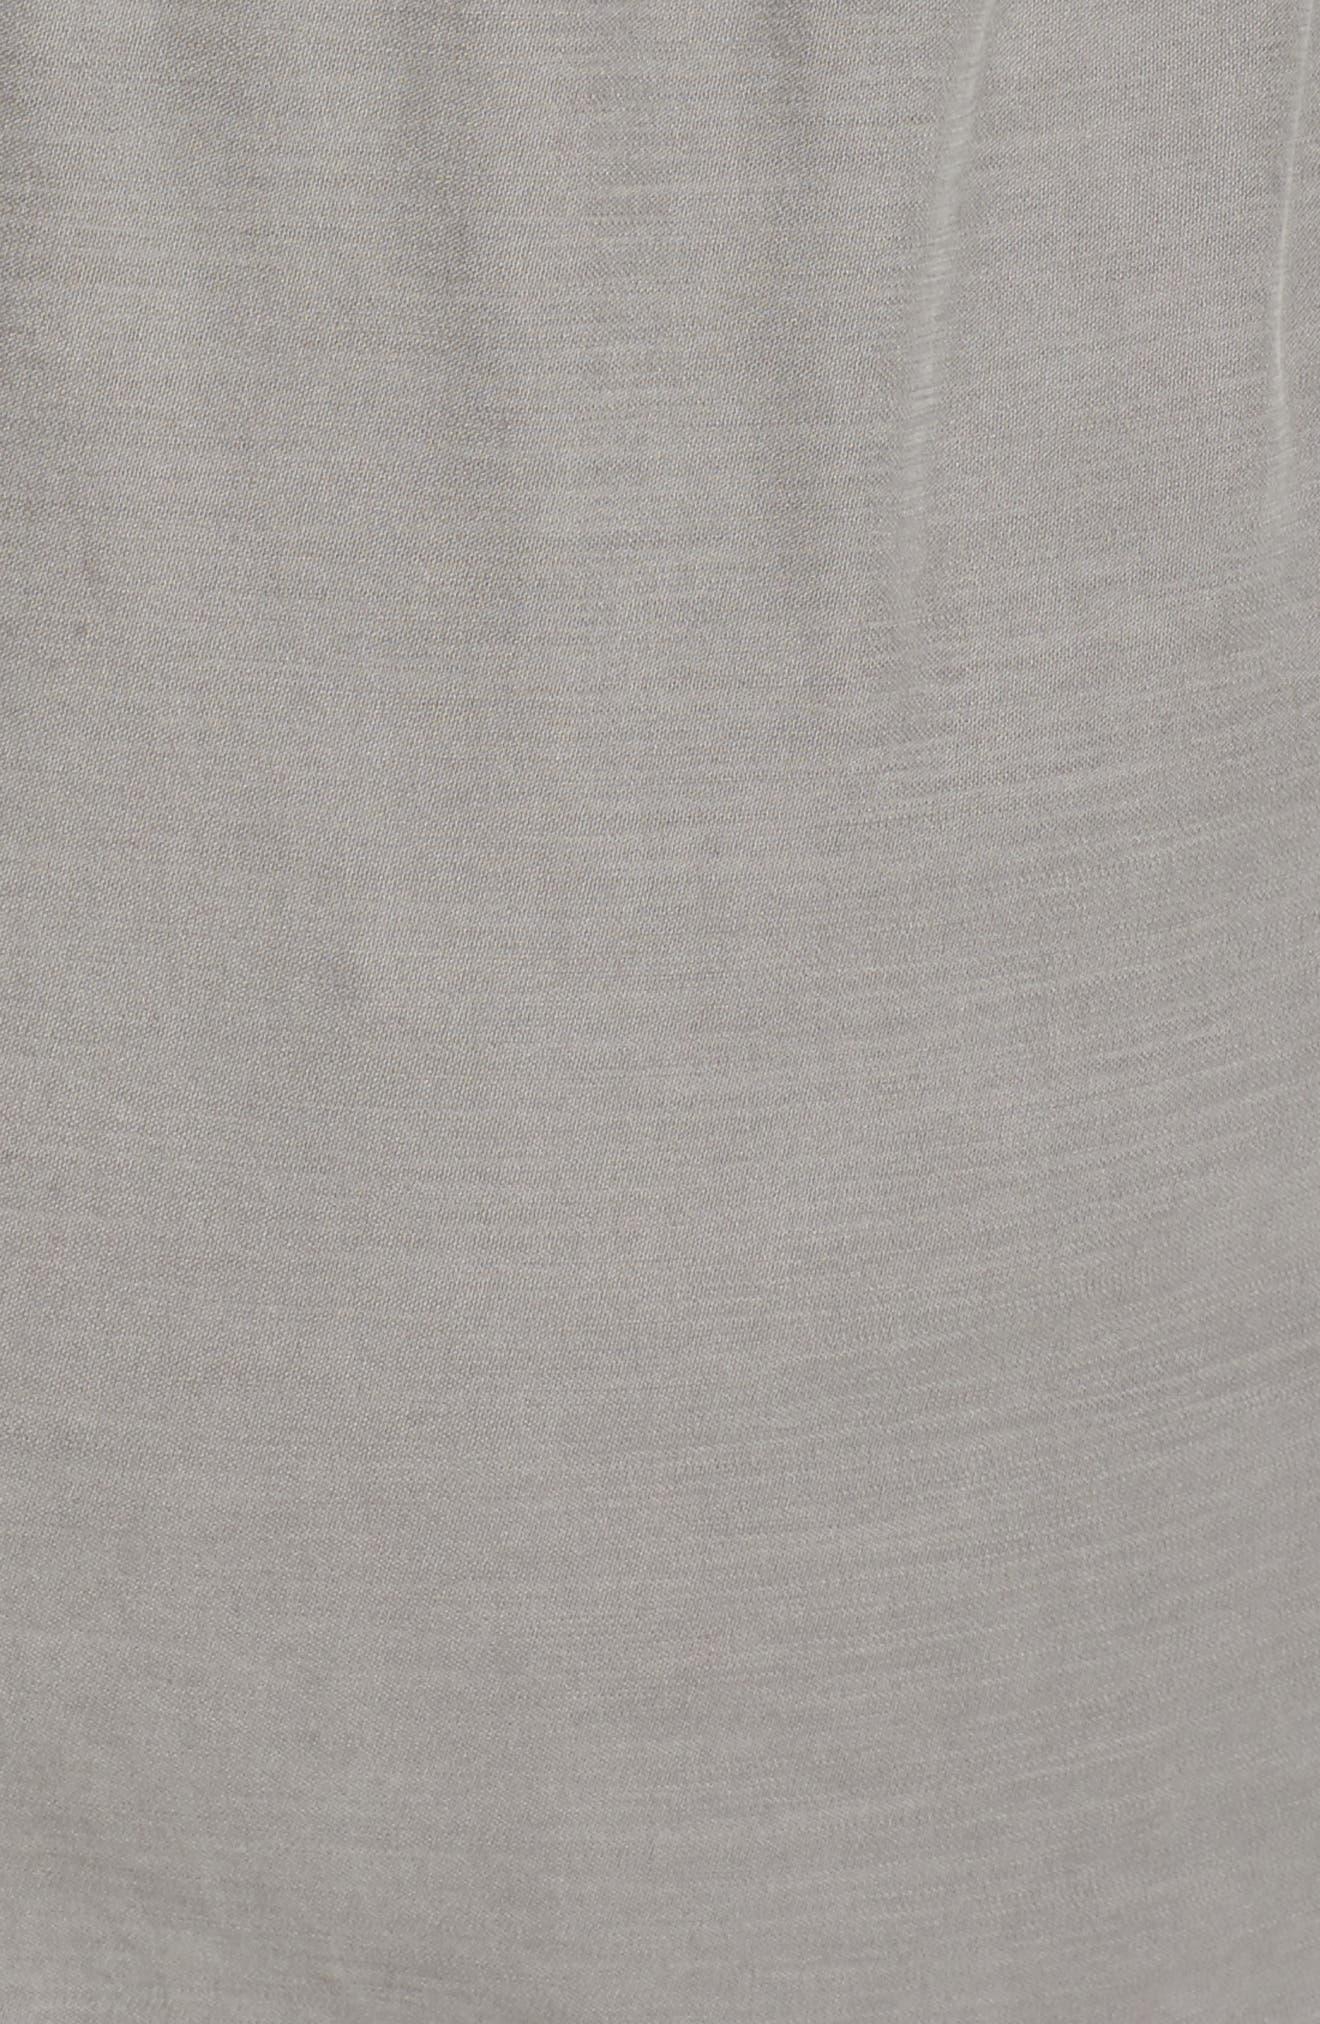 Cotton Fishtail Field Jacket,                             Alternate thumbnail 6, color,                             030